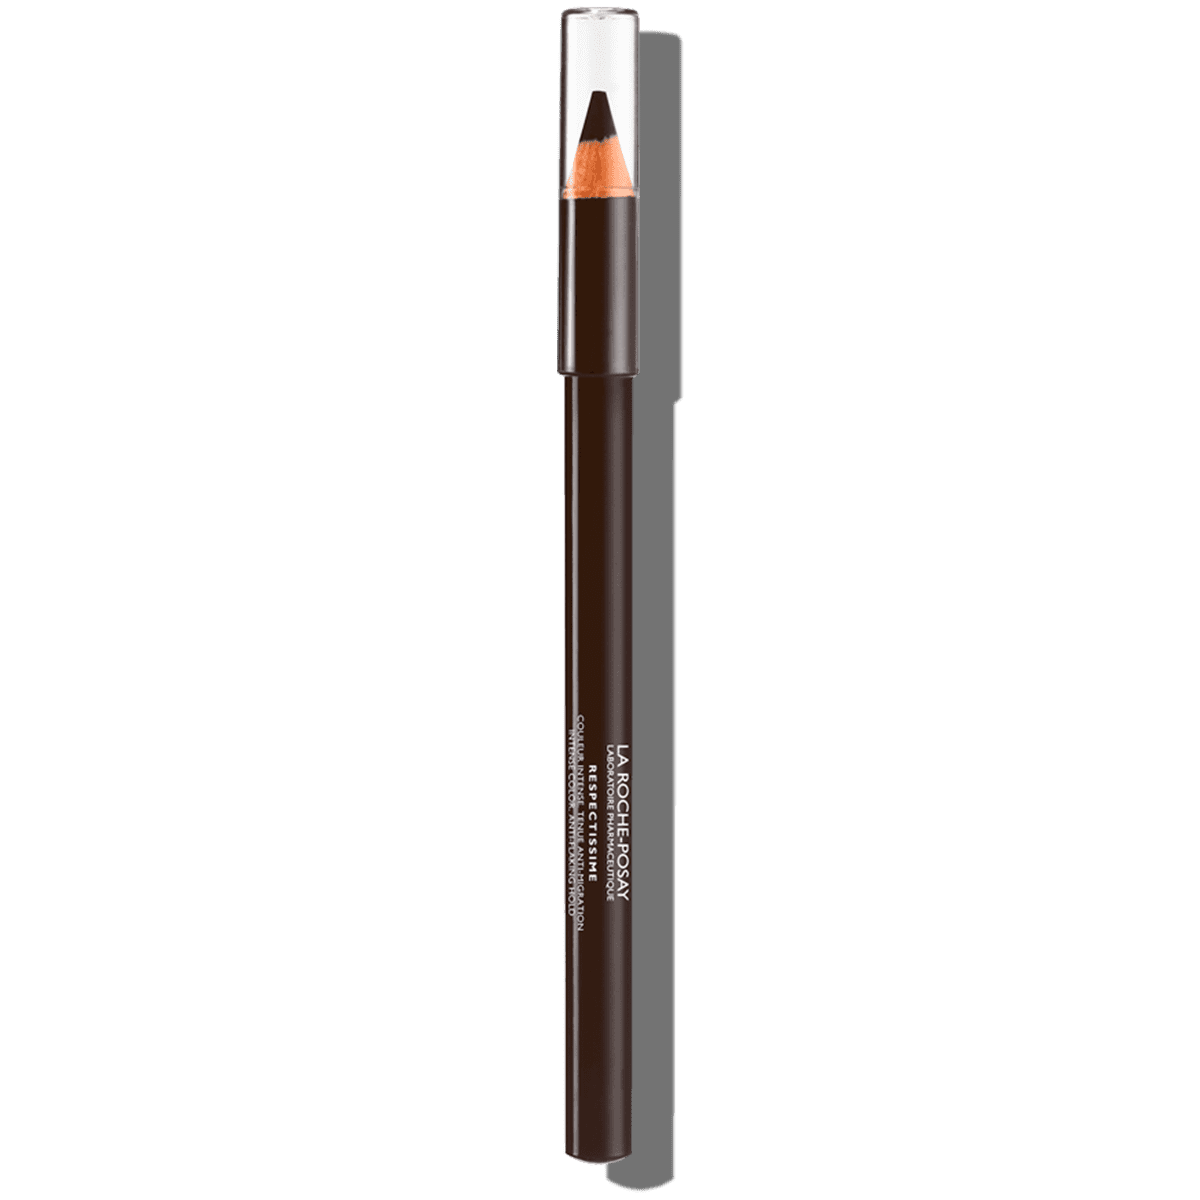 La Roche Posay Sensitiv Toleriane Makeup ØJENBLYANT Brun 3337872410